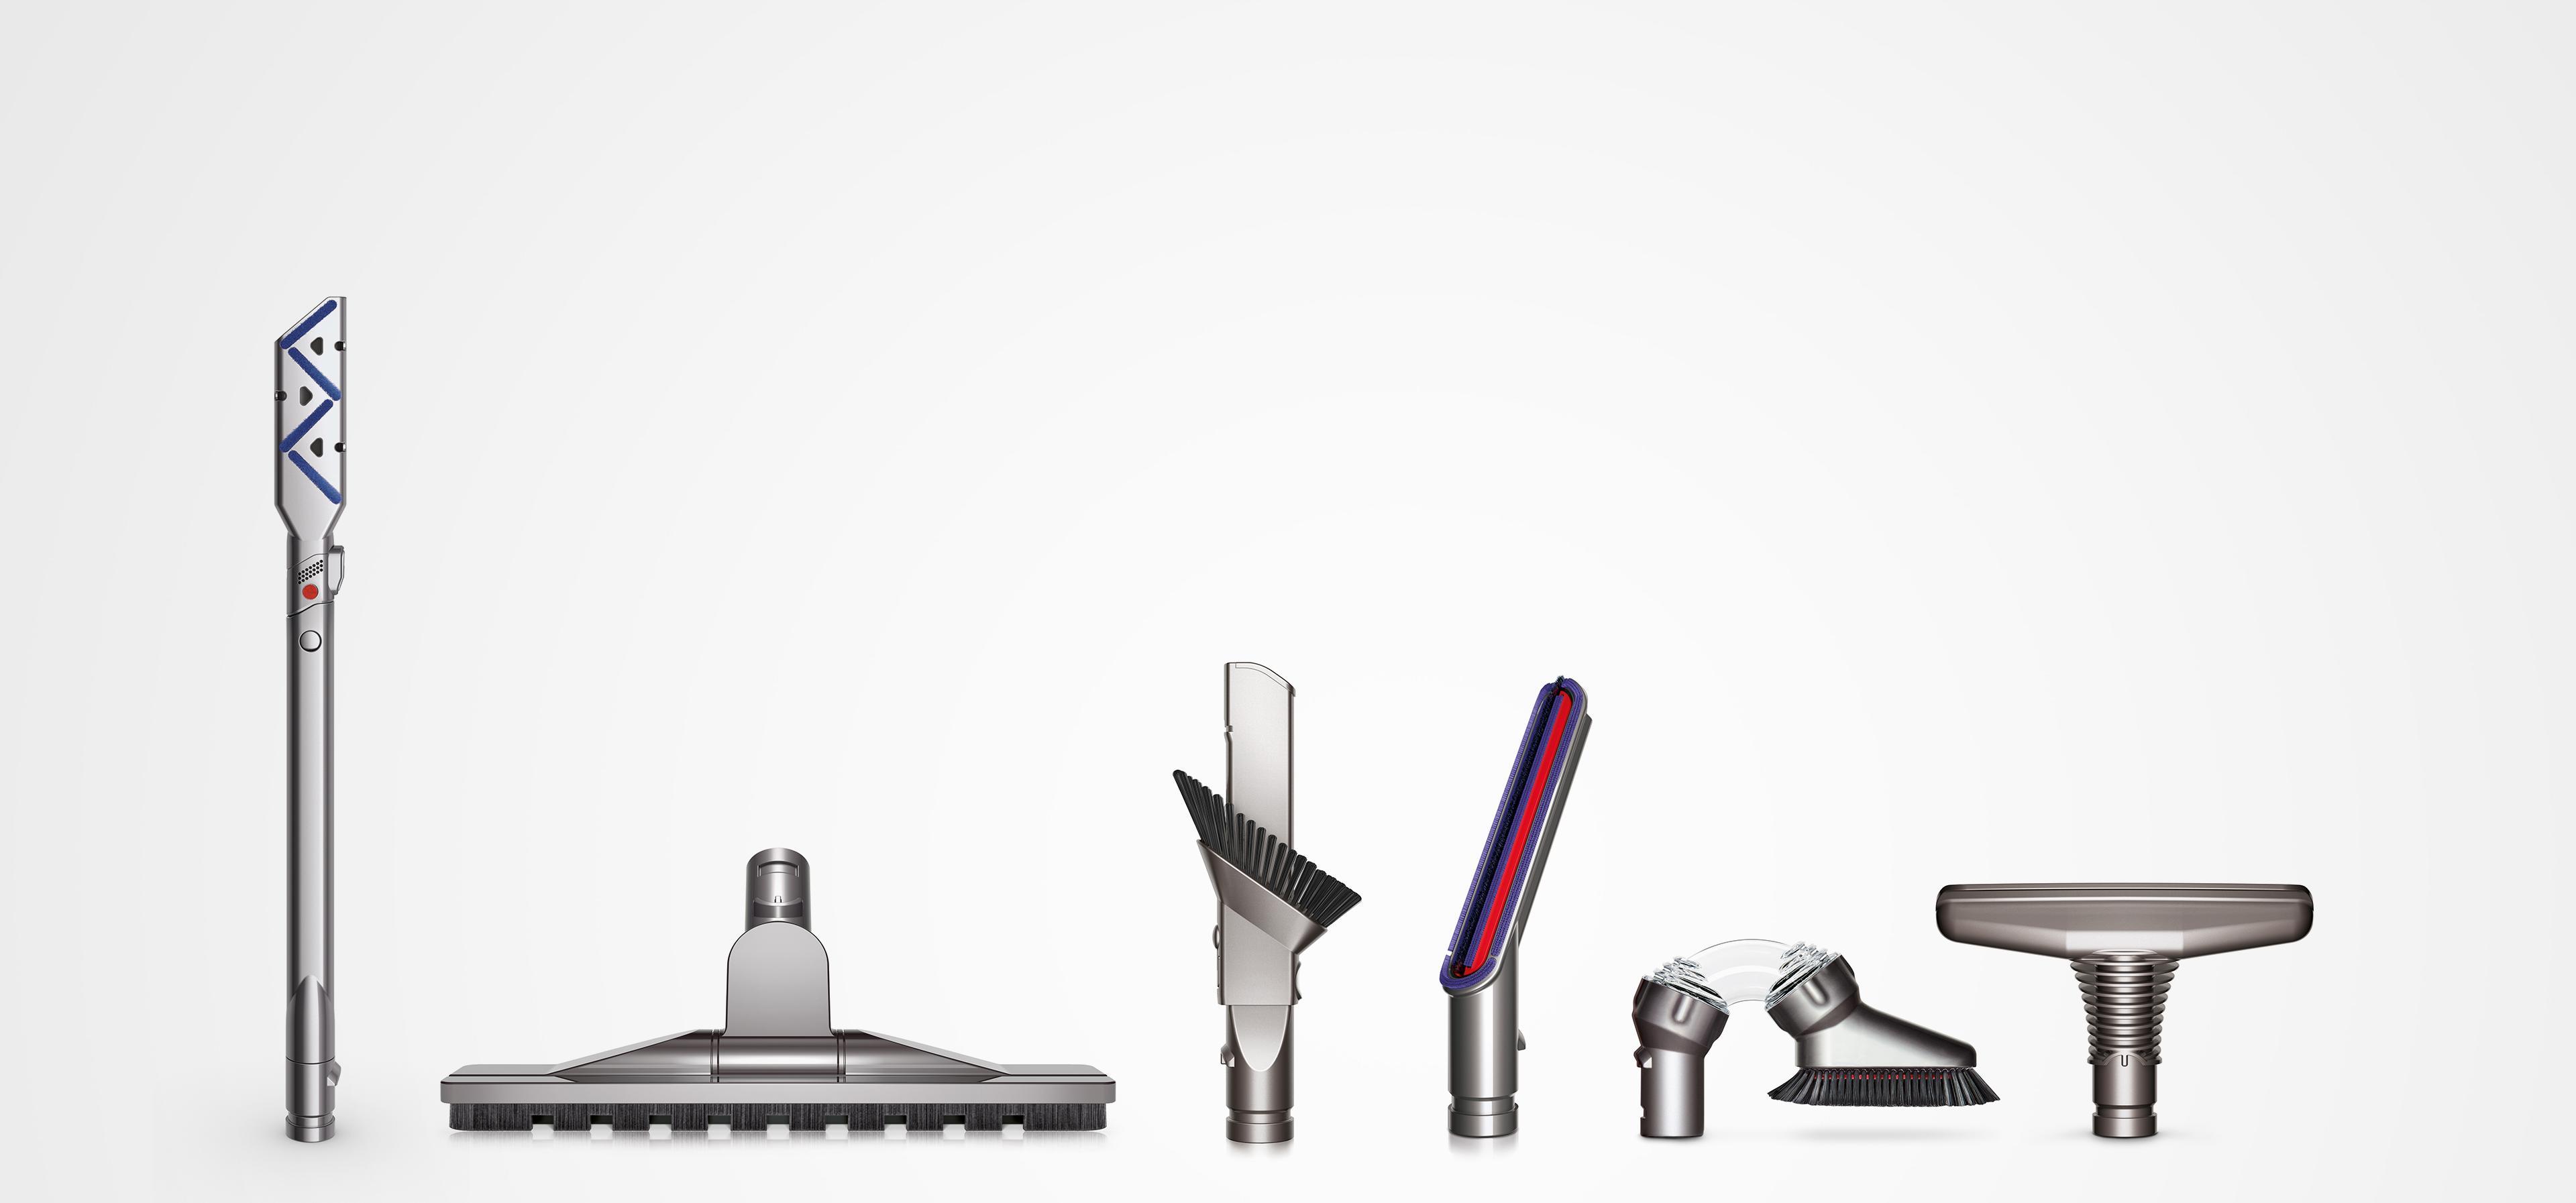 Six extra tools